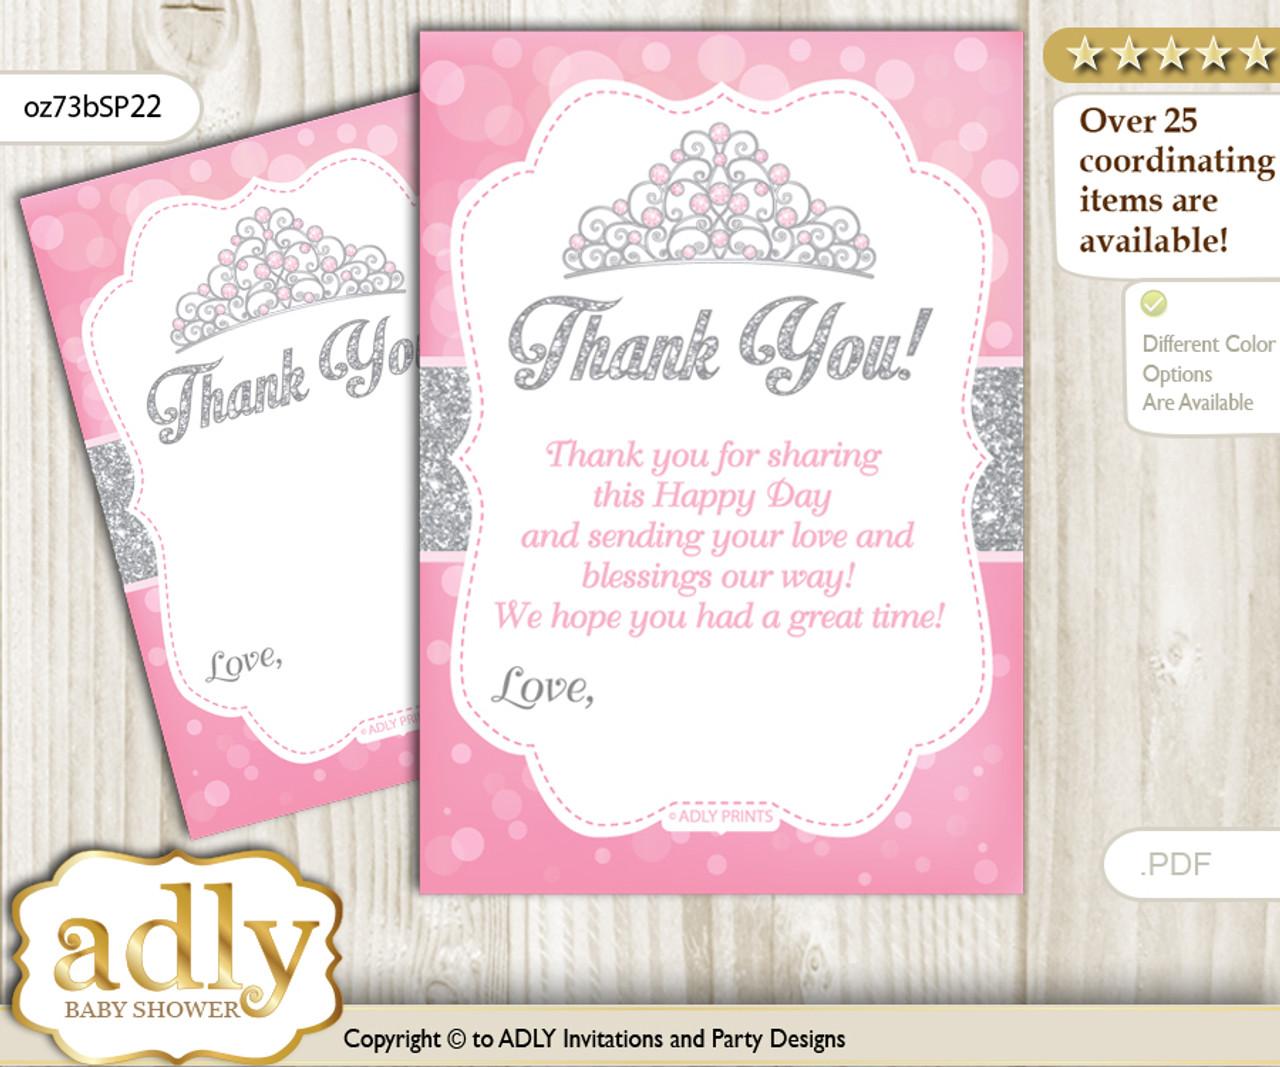 Princess Tiara Thank You Cards For A Baby Princess Shower Or